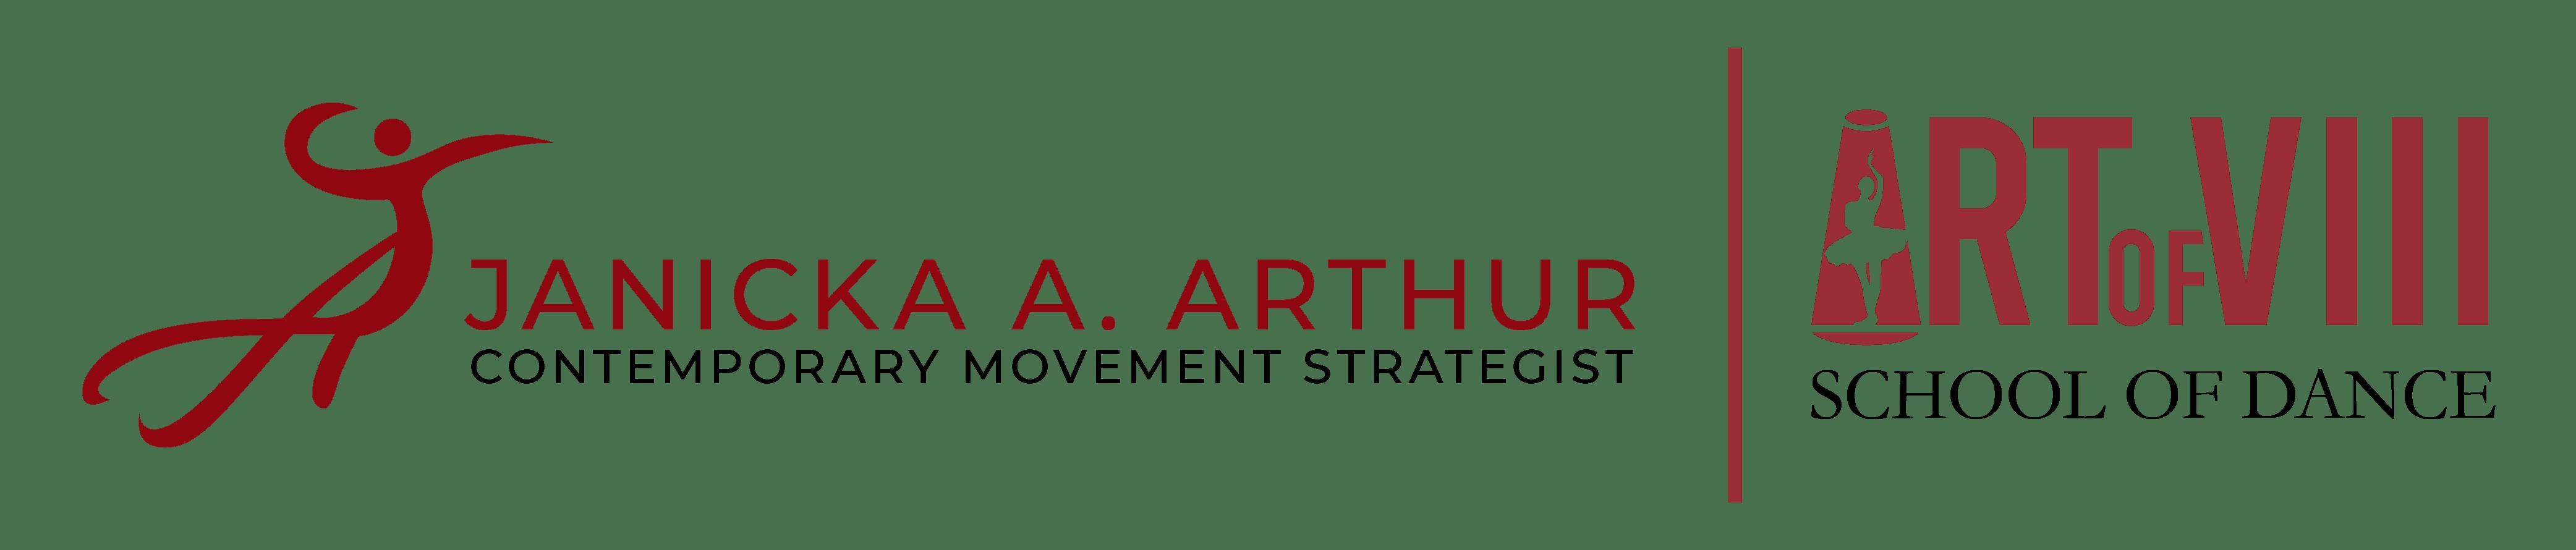 Janicka A. Arthur